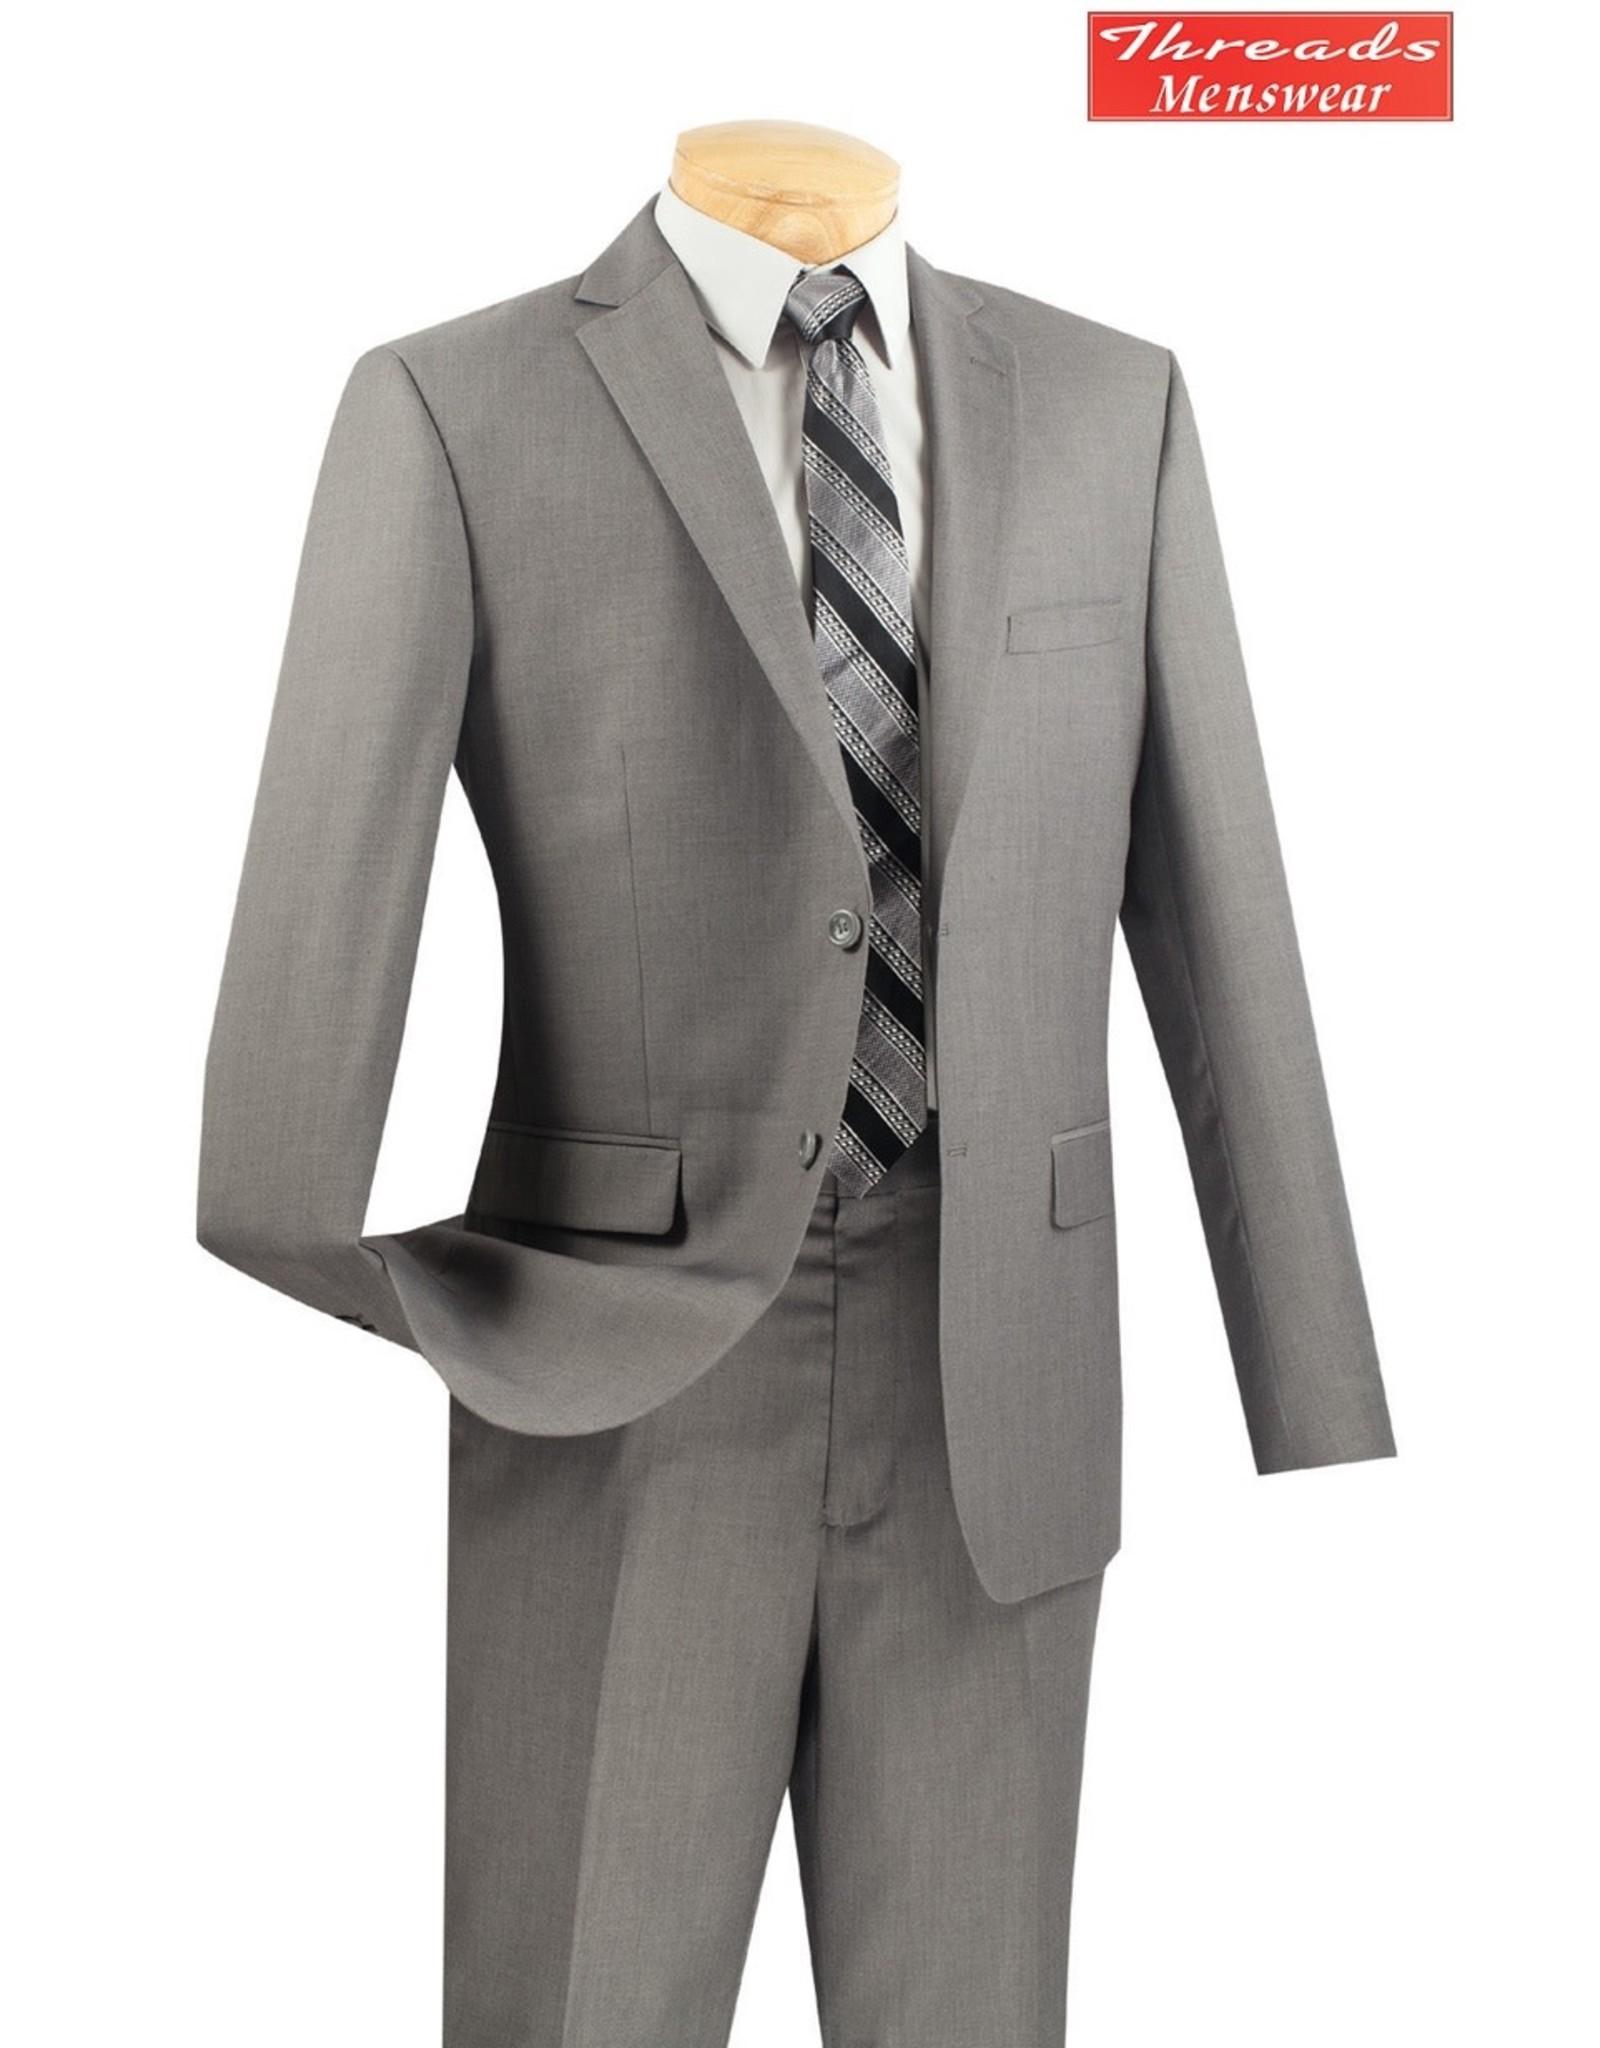 Vinci Vinci Ultra Slim Suit Gray US900-1